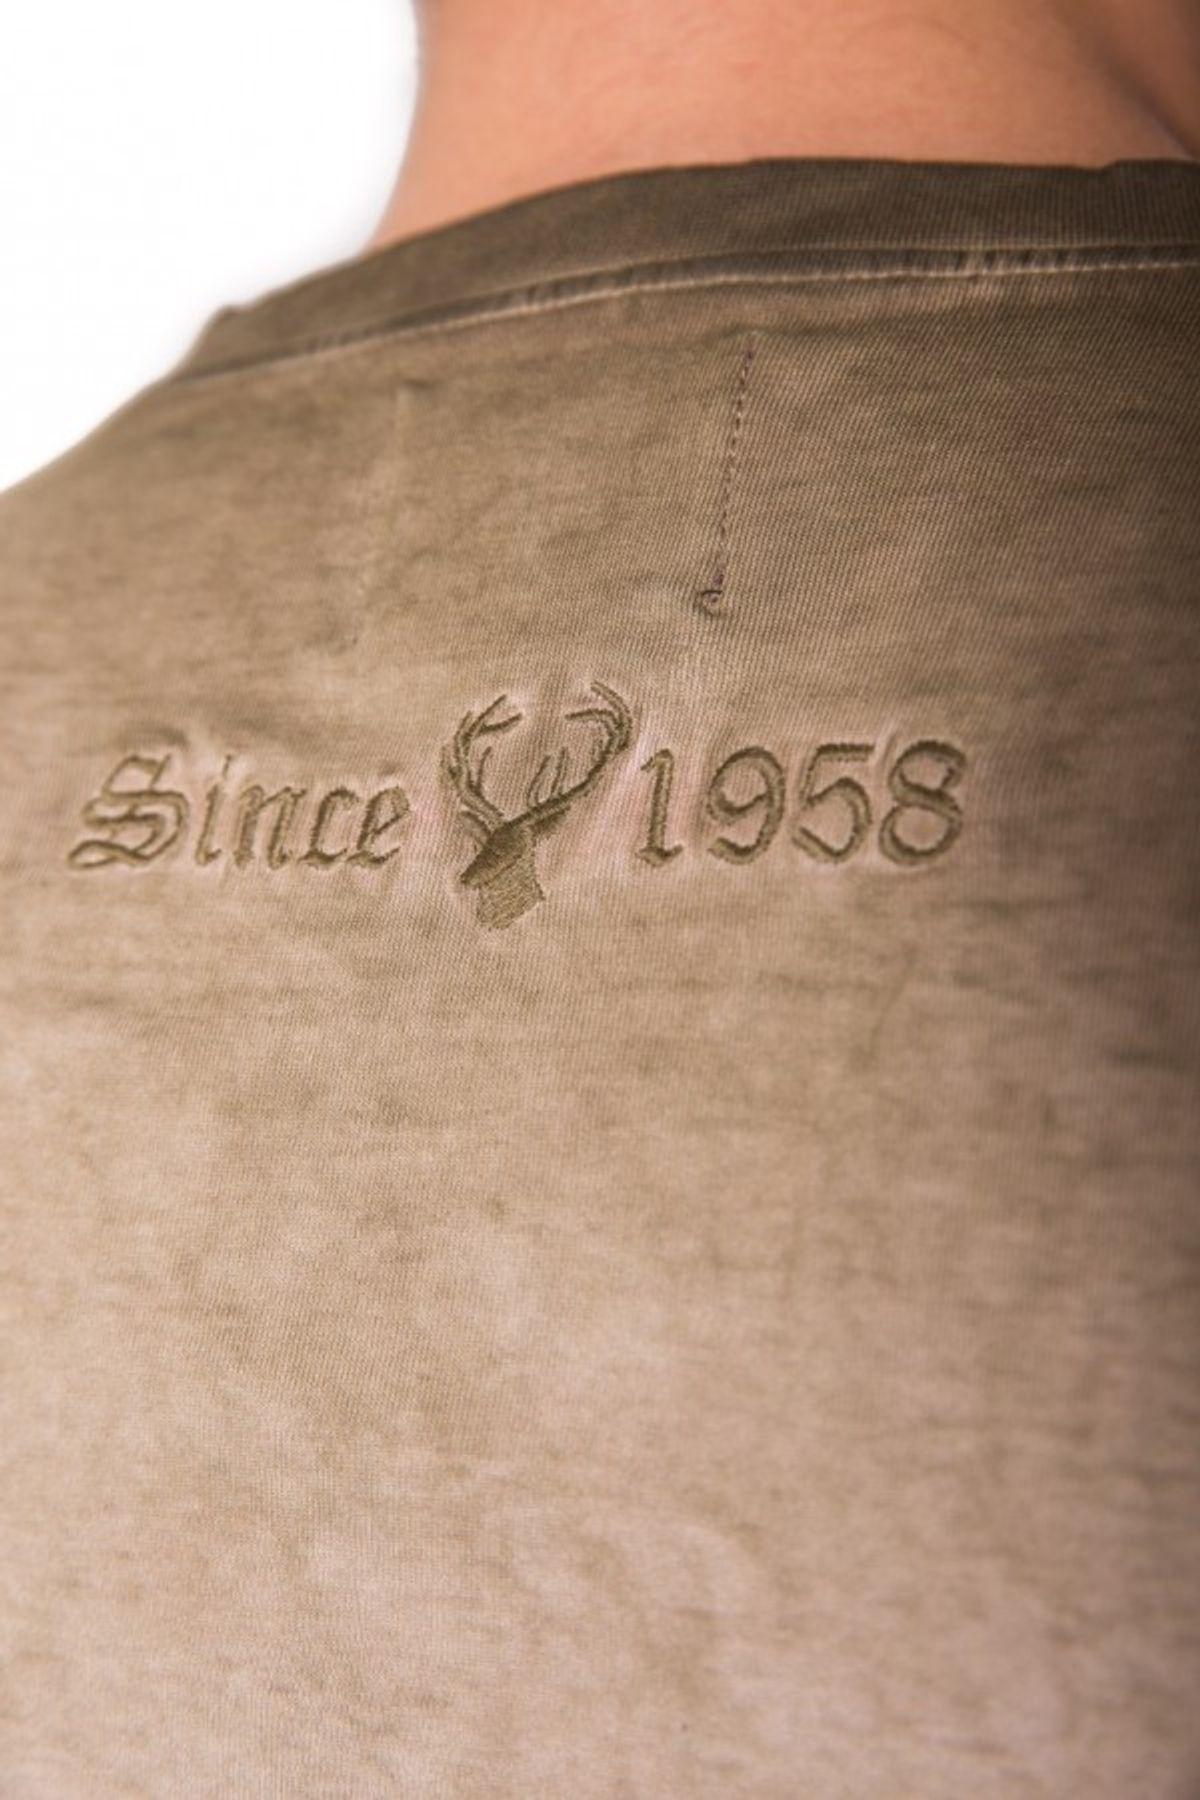 Krüger - Herren Trachten T-Shirt in braun, Seppelhose (91280-7) – Bild 6